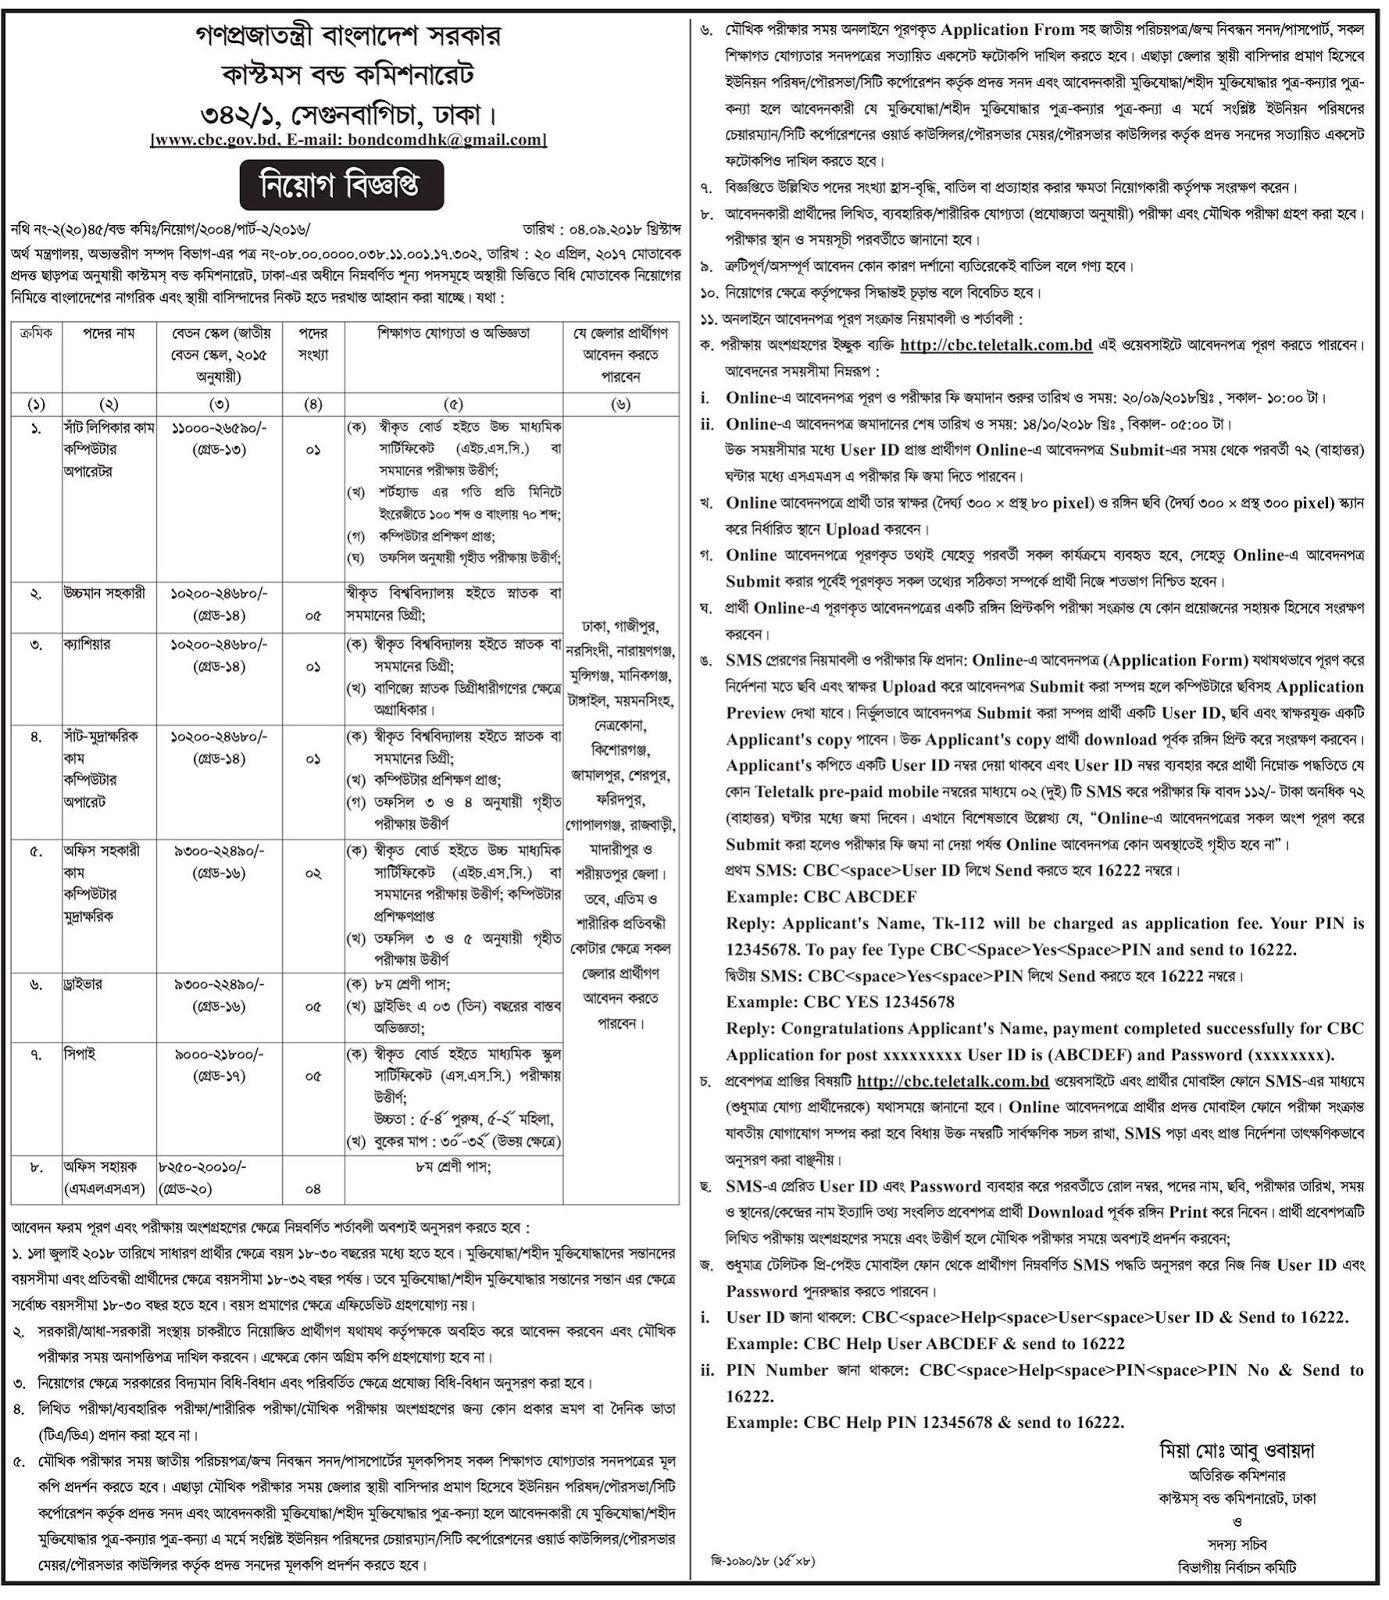 bdjobs info: Bangladesh Customs Commissionrate jobs circular 20